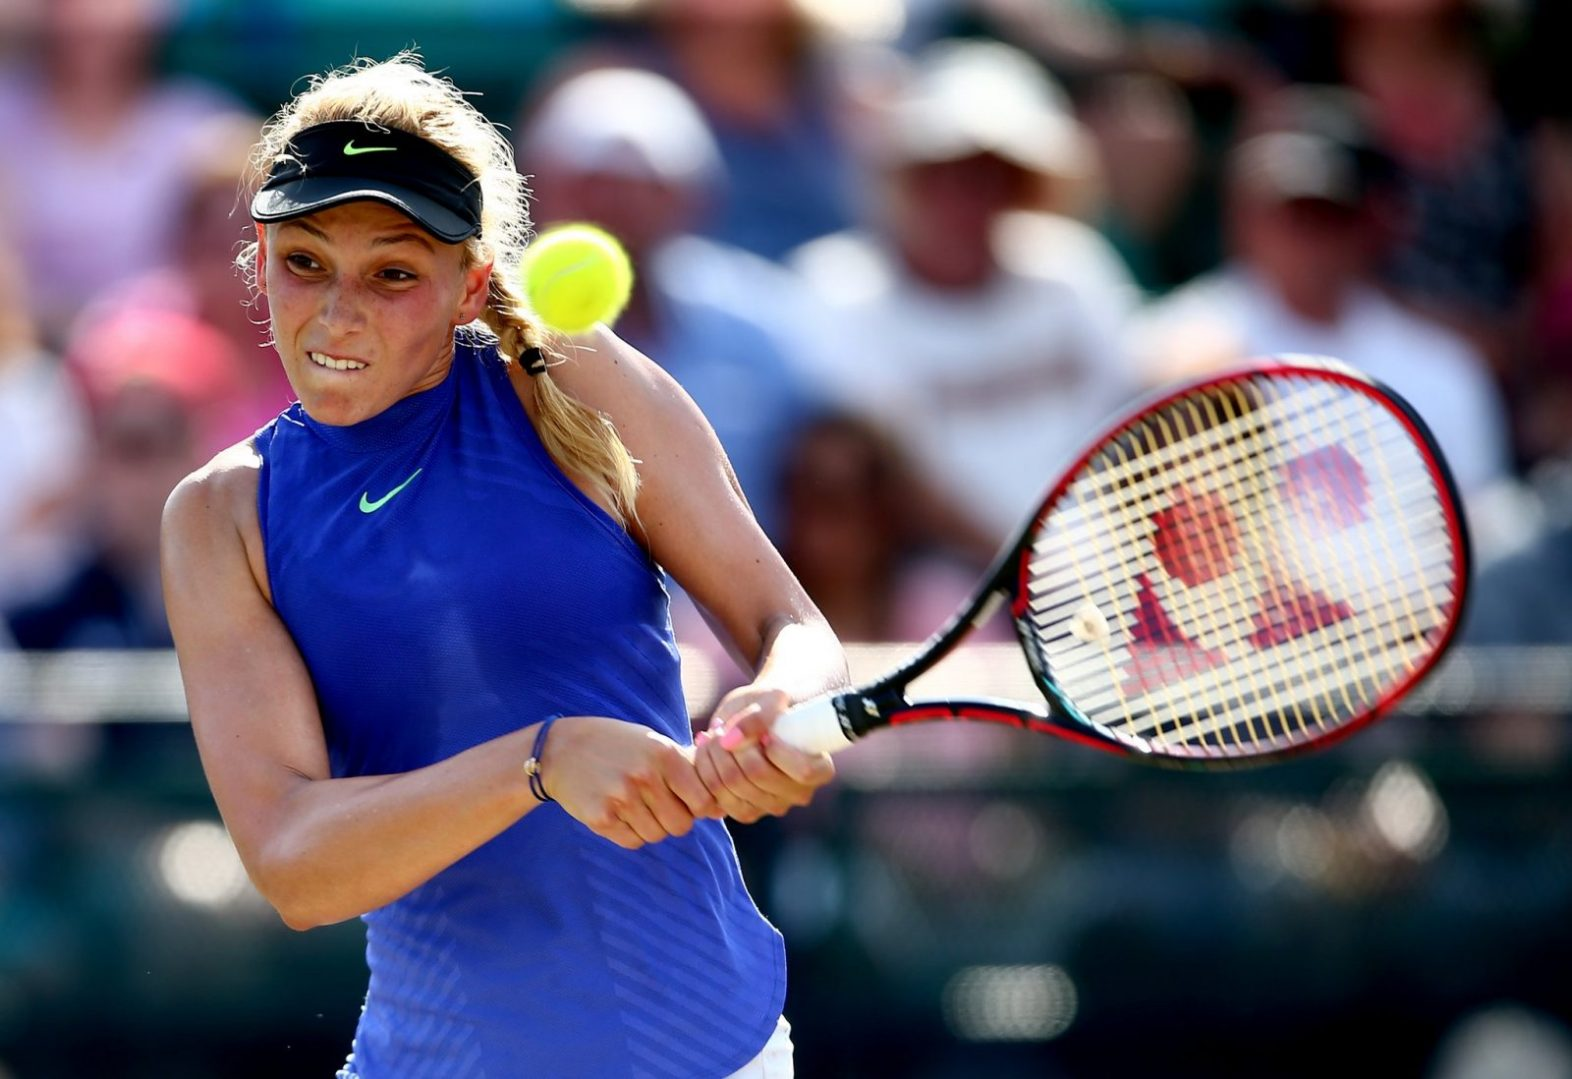 Donna Vekić odigrala je sjajan tenis u gradu Robina Hooda